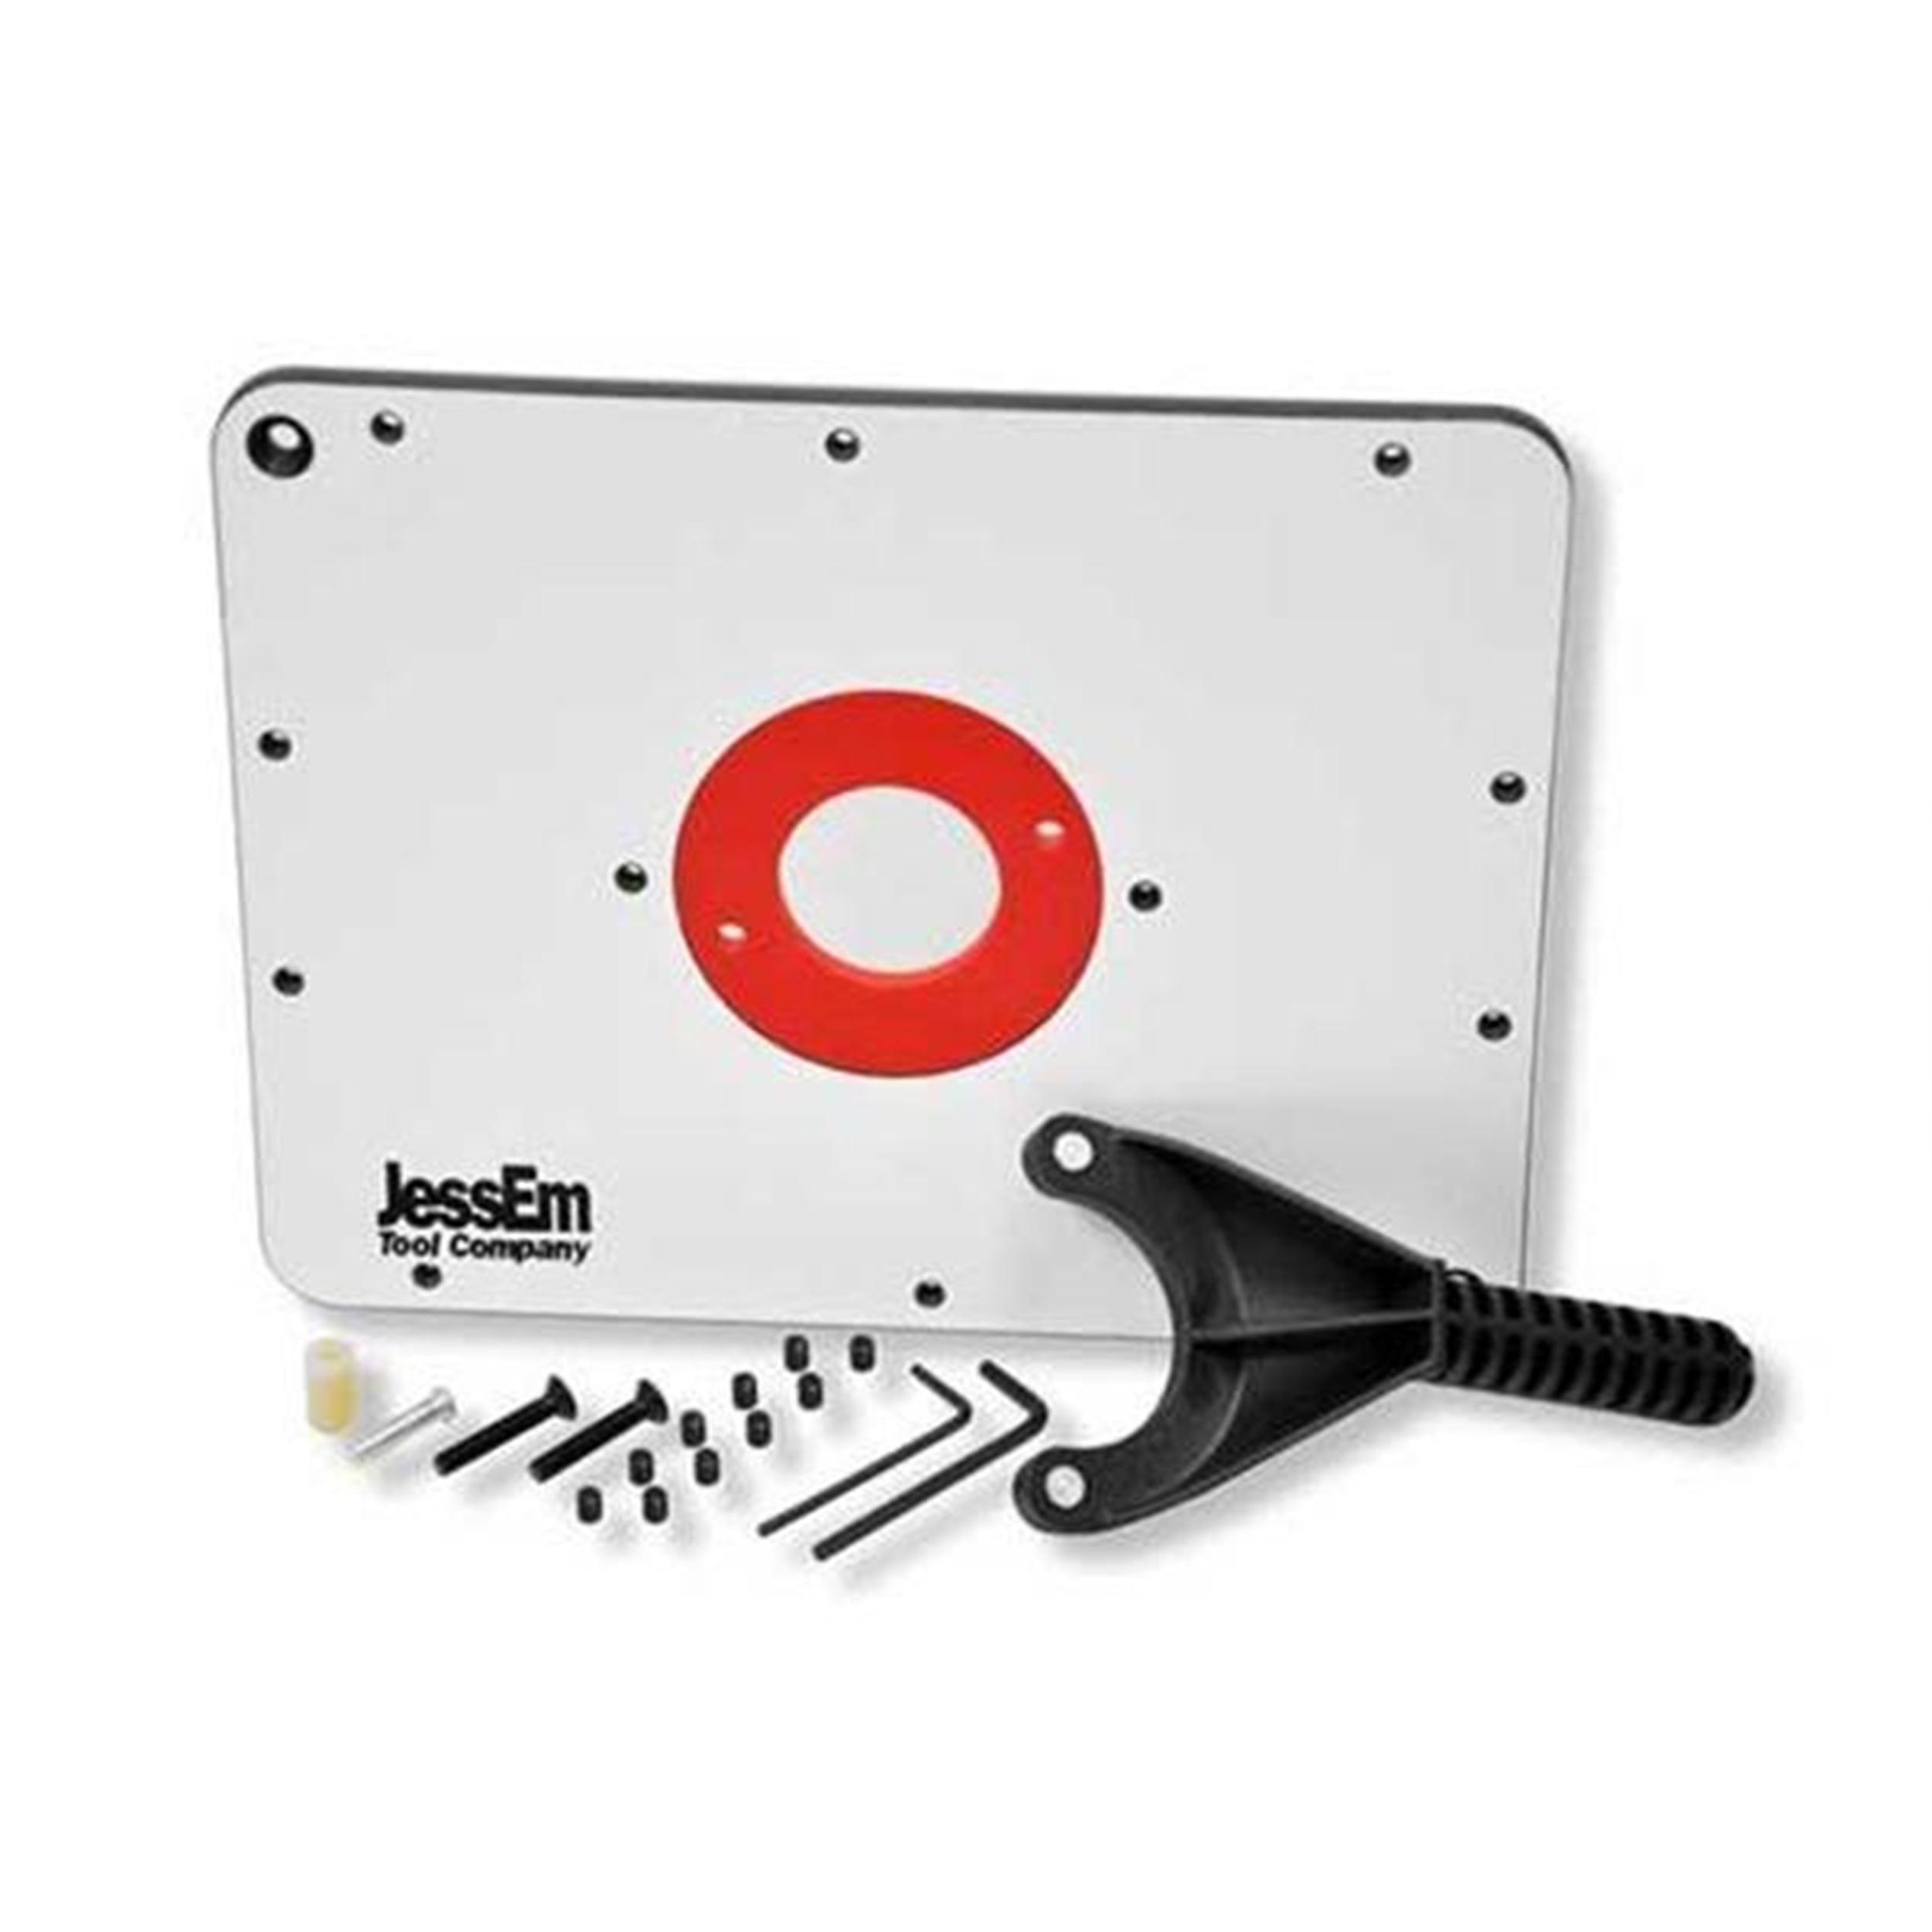 JessEm Rout-R-Plate Phenolic Router Table Insert Plate, JessEm# 03101